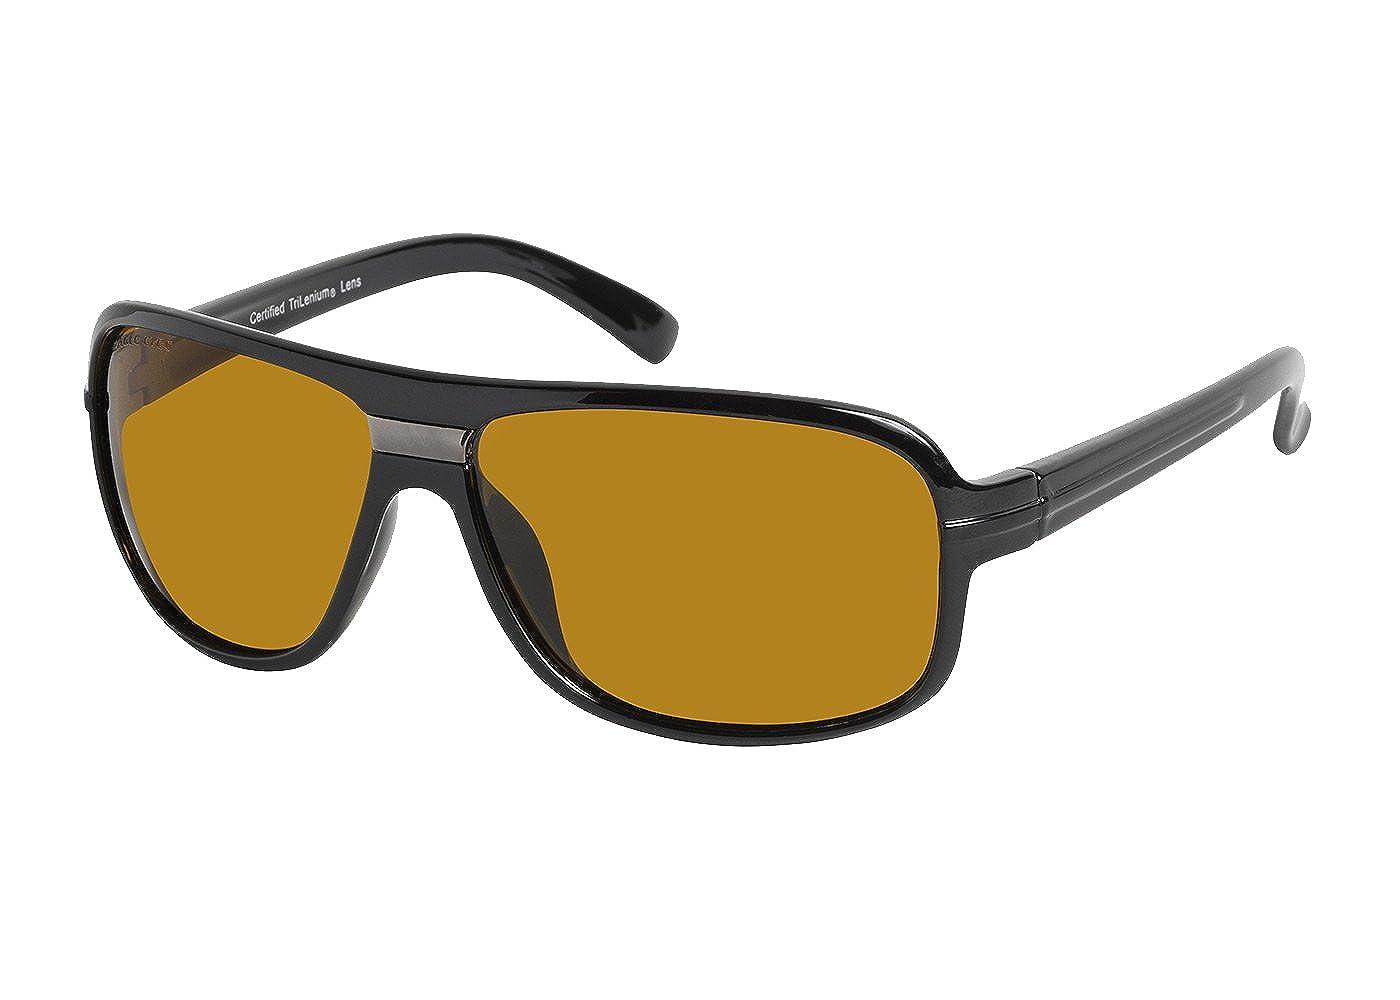 af616d70109 Eagle Eyes STEALTH Polarized Sunglasses- UVA